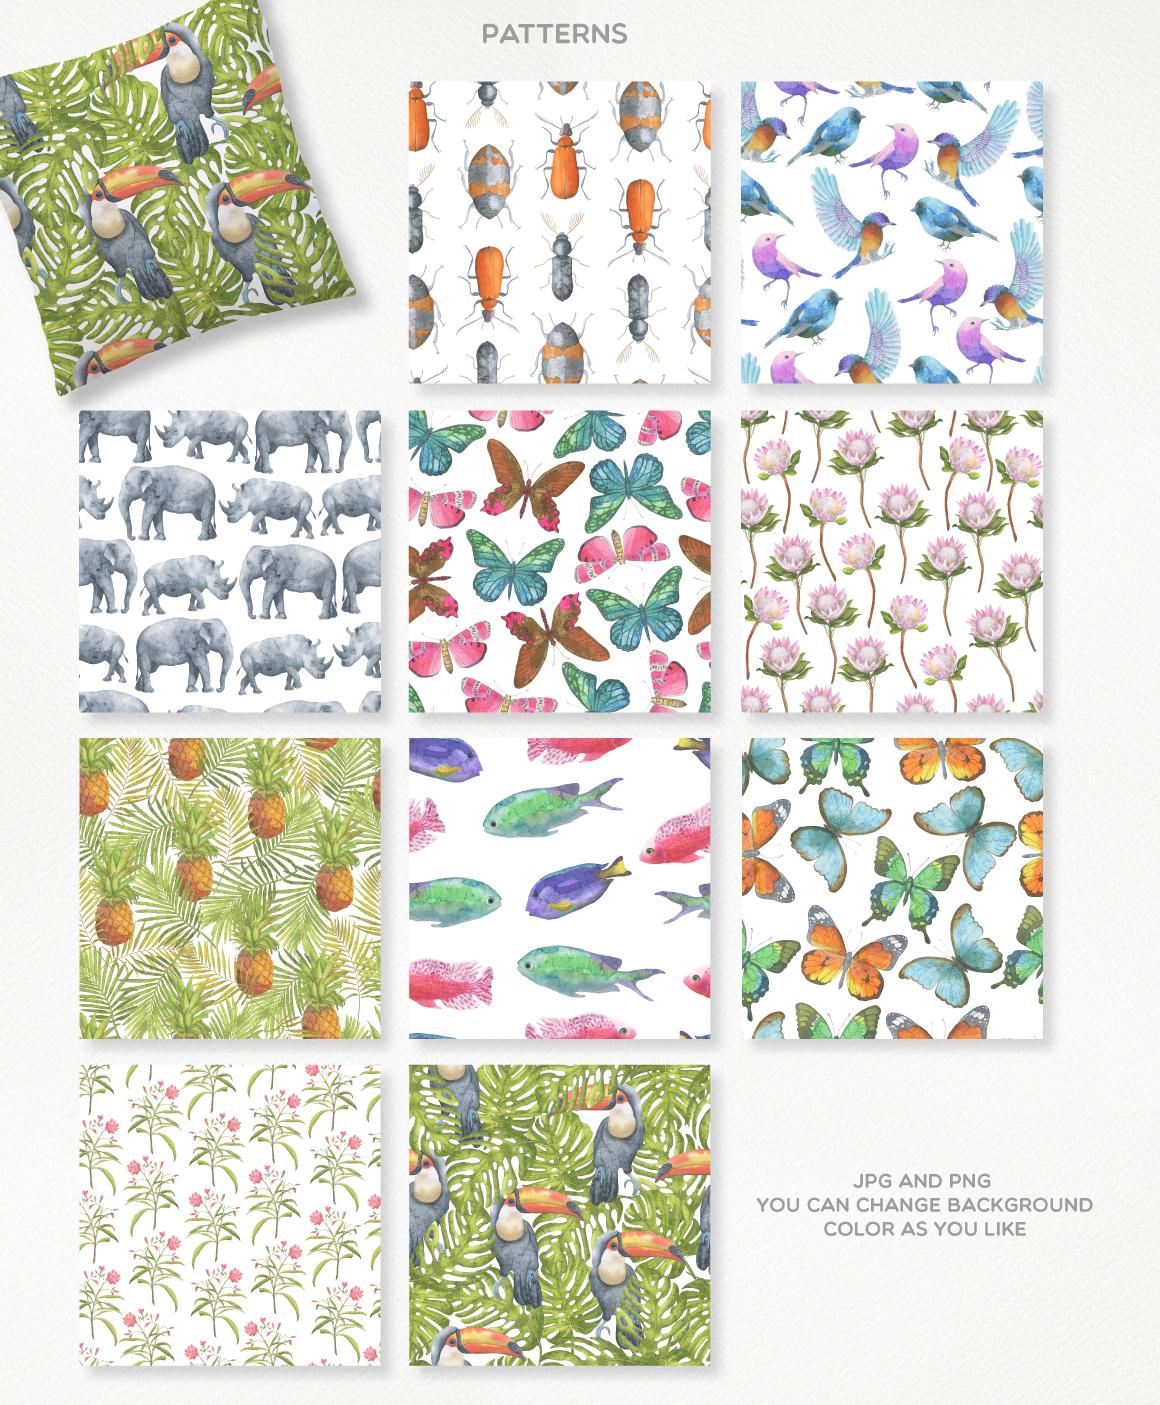 高清手绘野生动物大象犀牛水彩元素PNG图片素材 Safari Watercolor Collection插图(3)